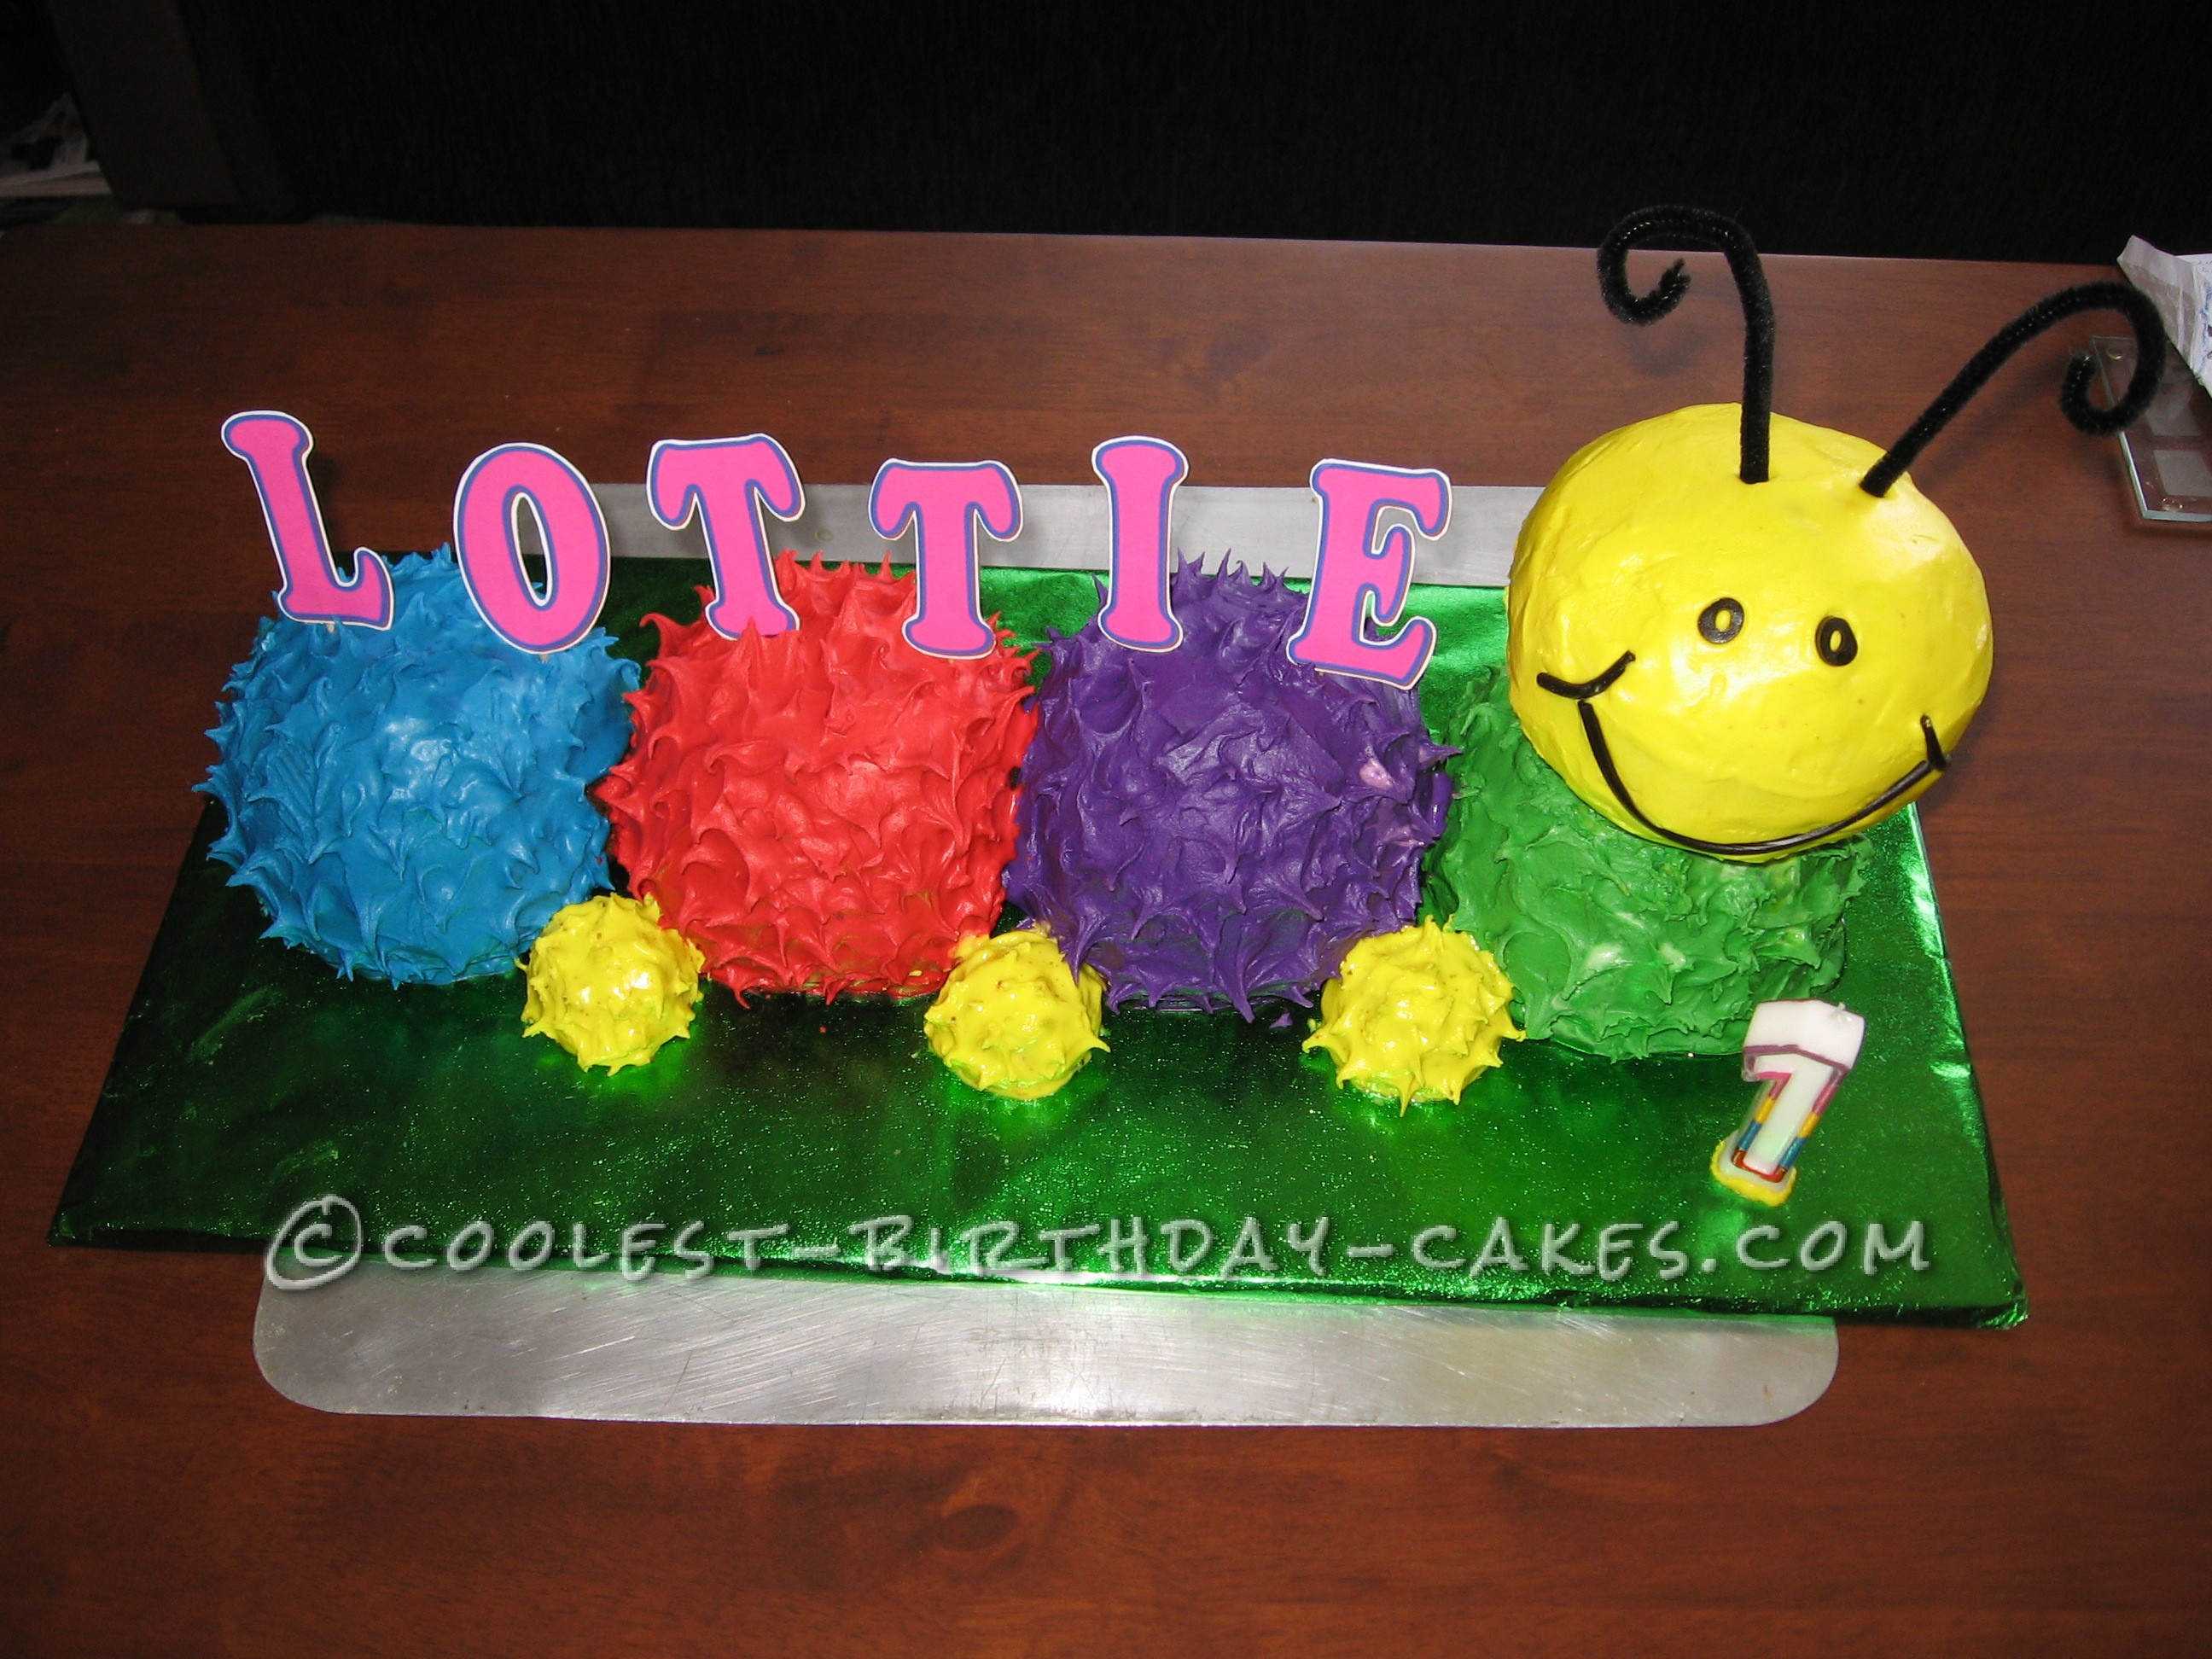 Colourful Caterpillar Cake